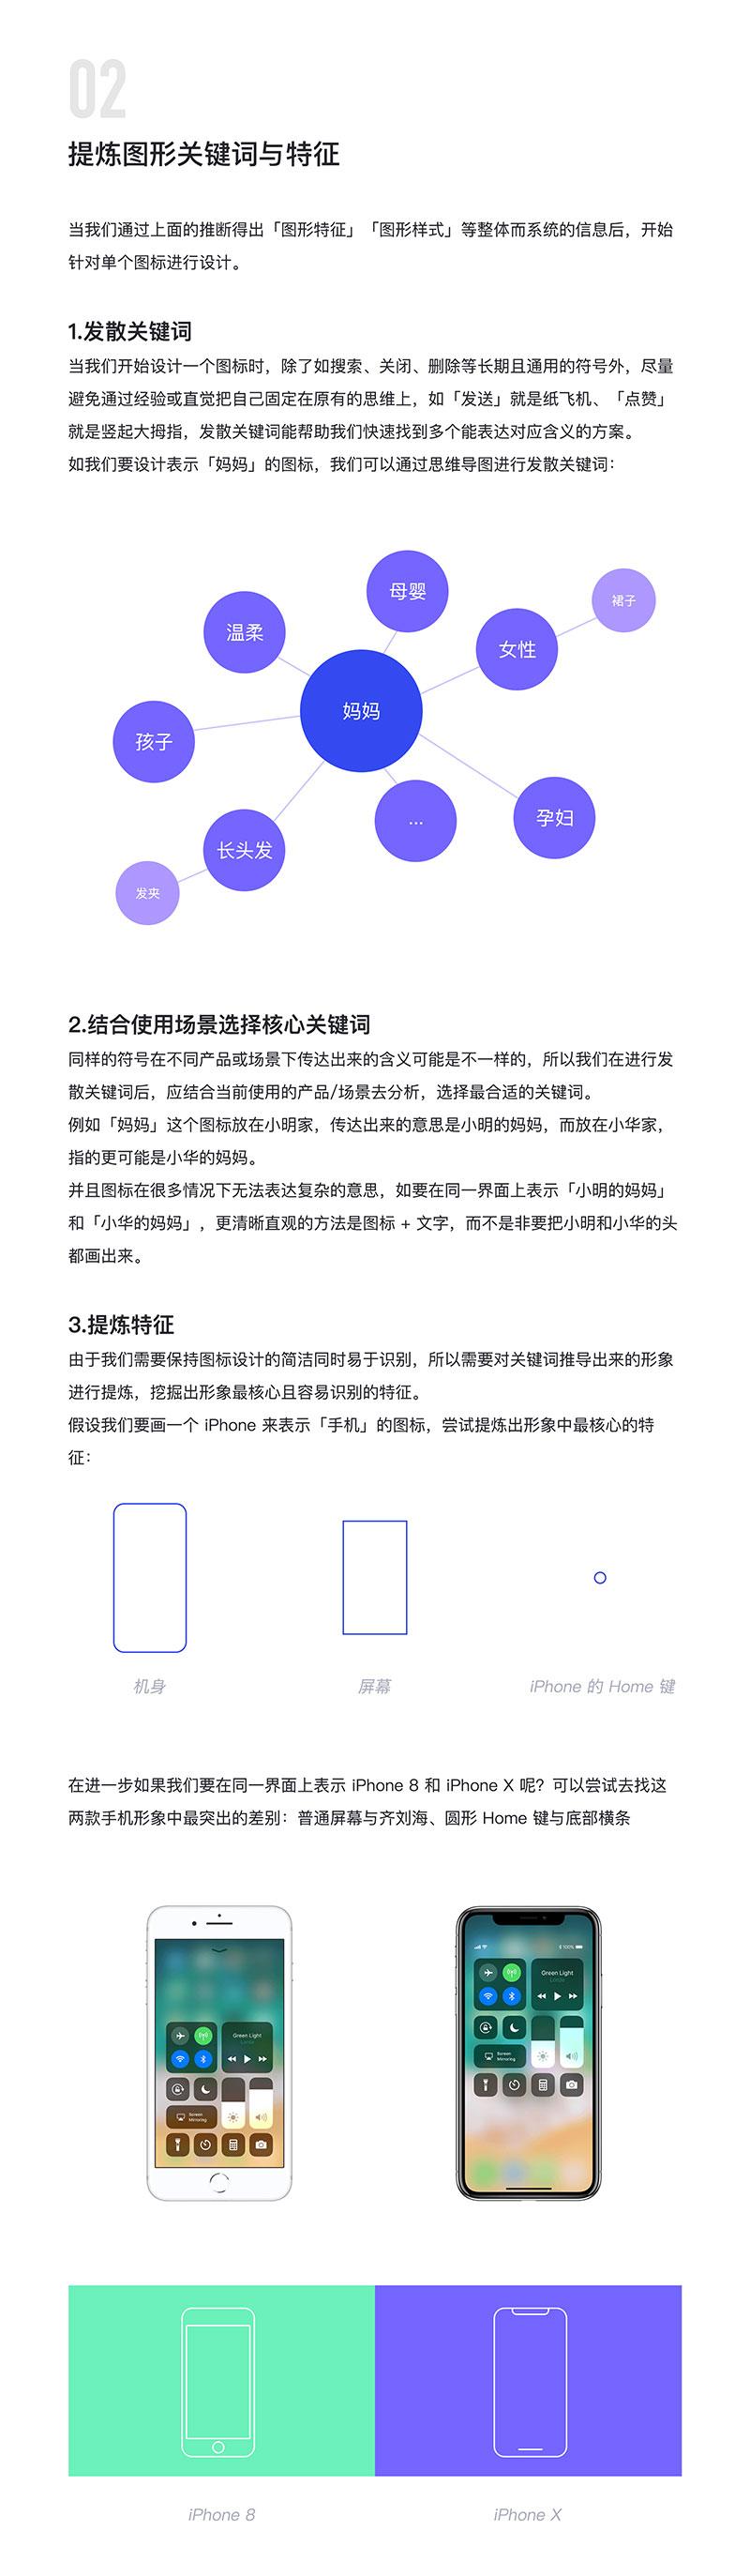 Icons design four step method 2